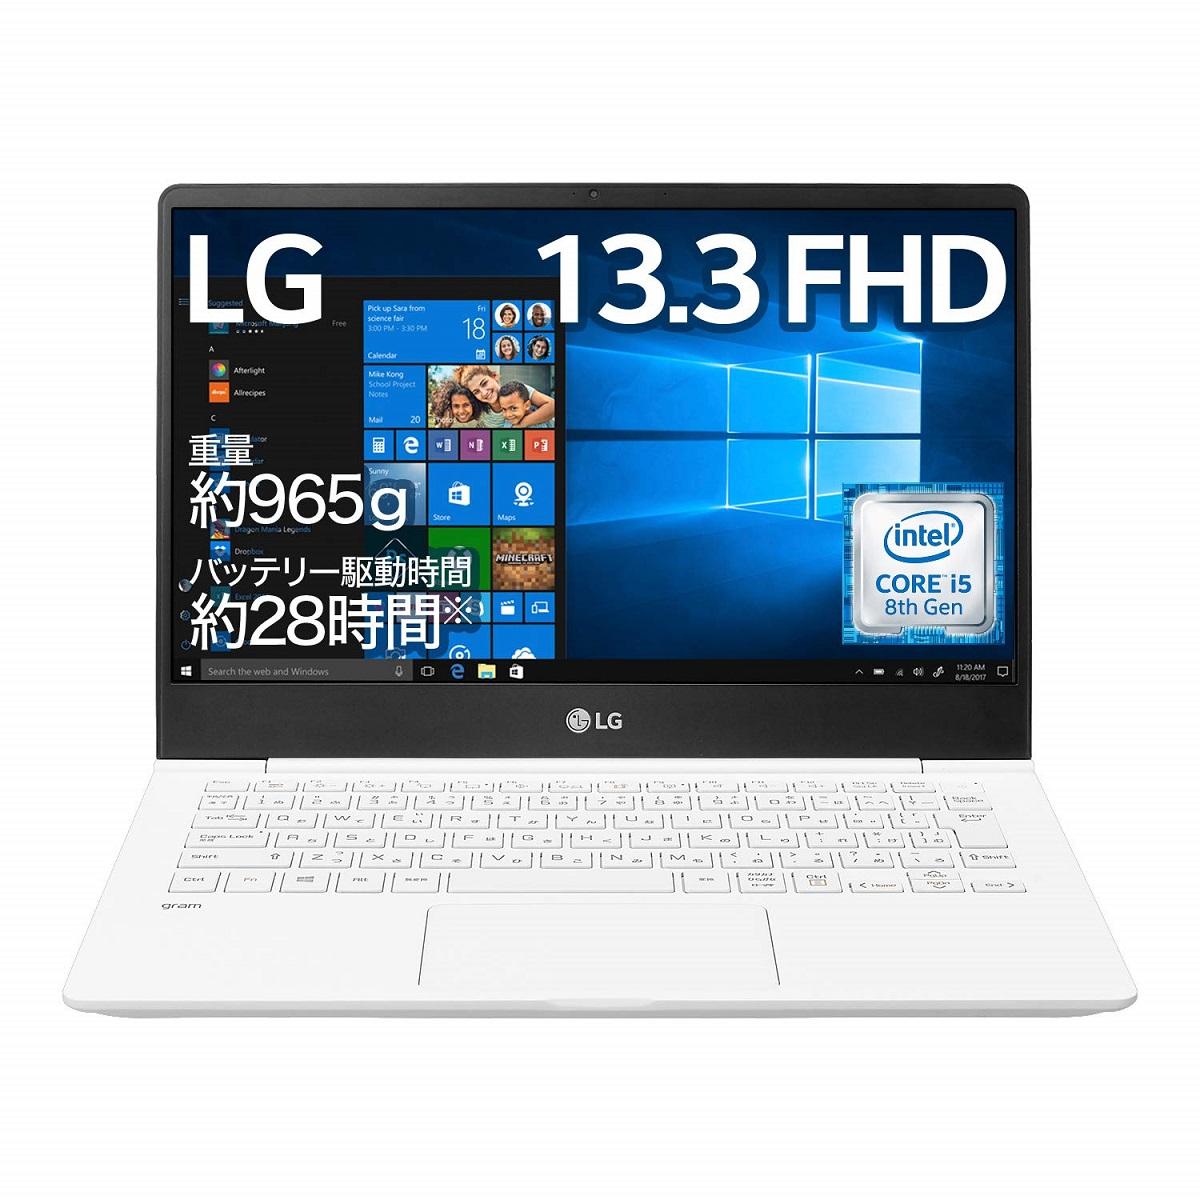 LG ノートパソコン gram 965g/バッテリー最大28時間/Core i5/13.3インチ/Windows 10/メモリ 8GB/SSD 256GB/ホワイト/13Z990-GA54J